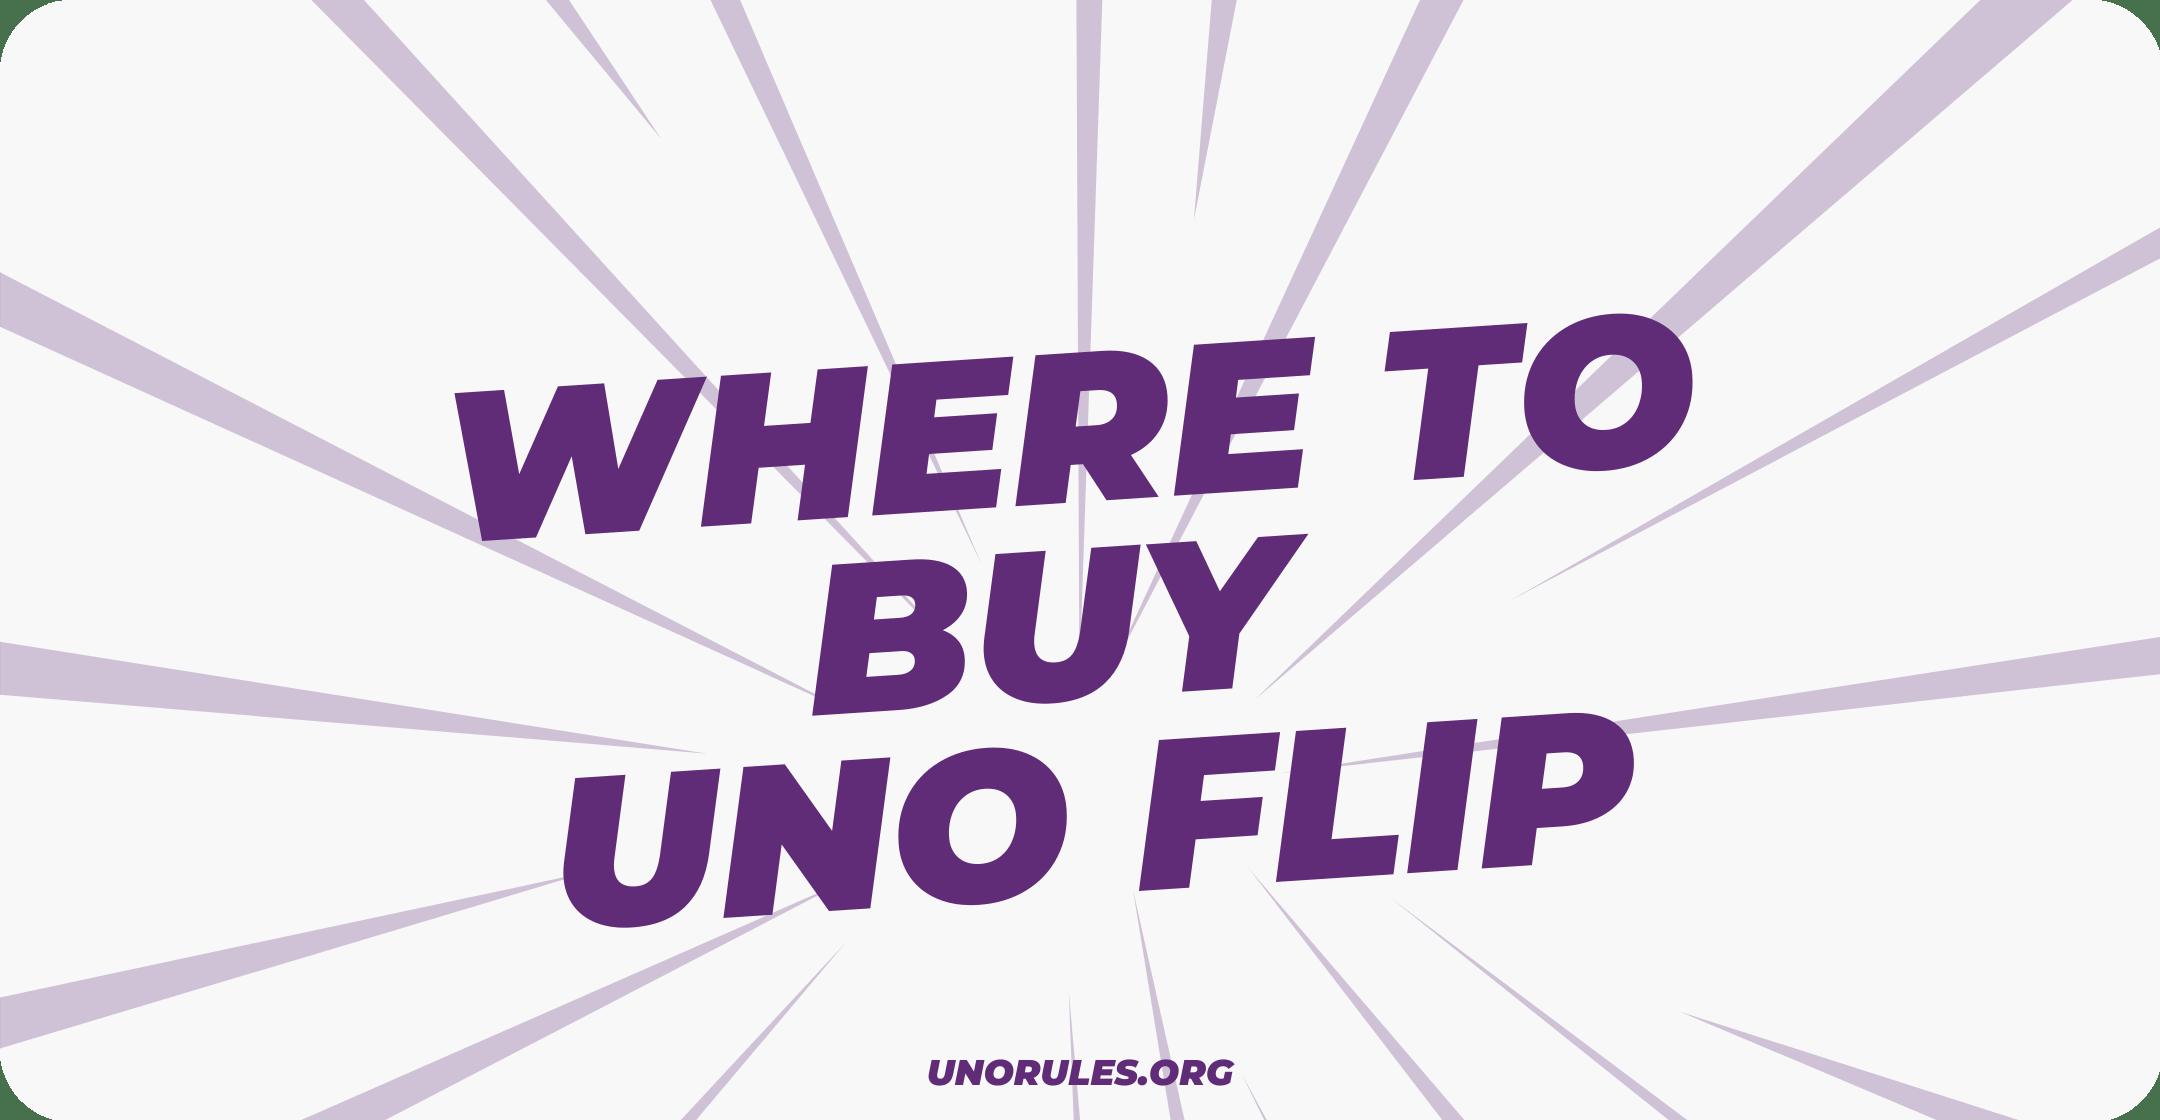 Where to buy uno flip